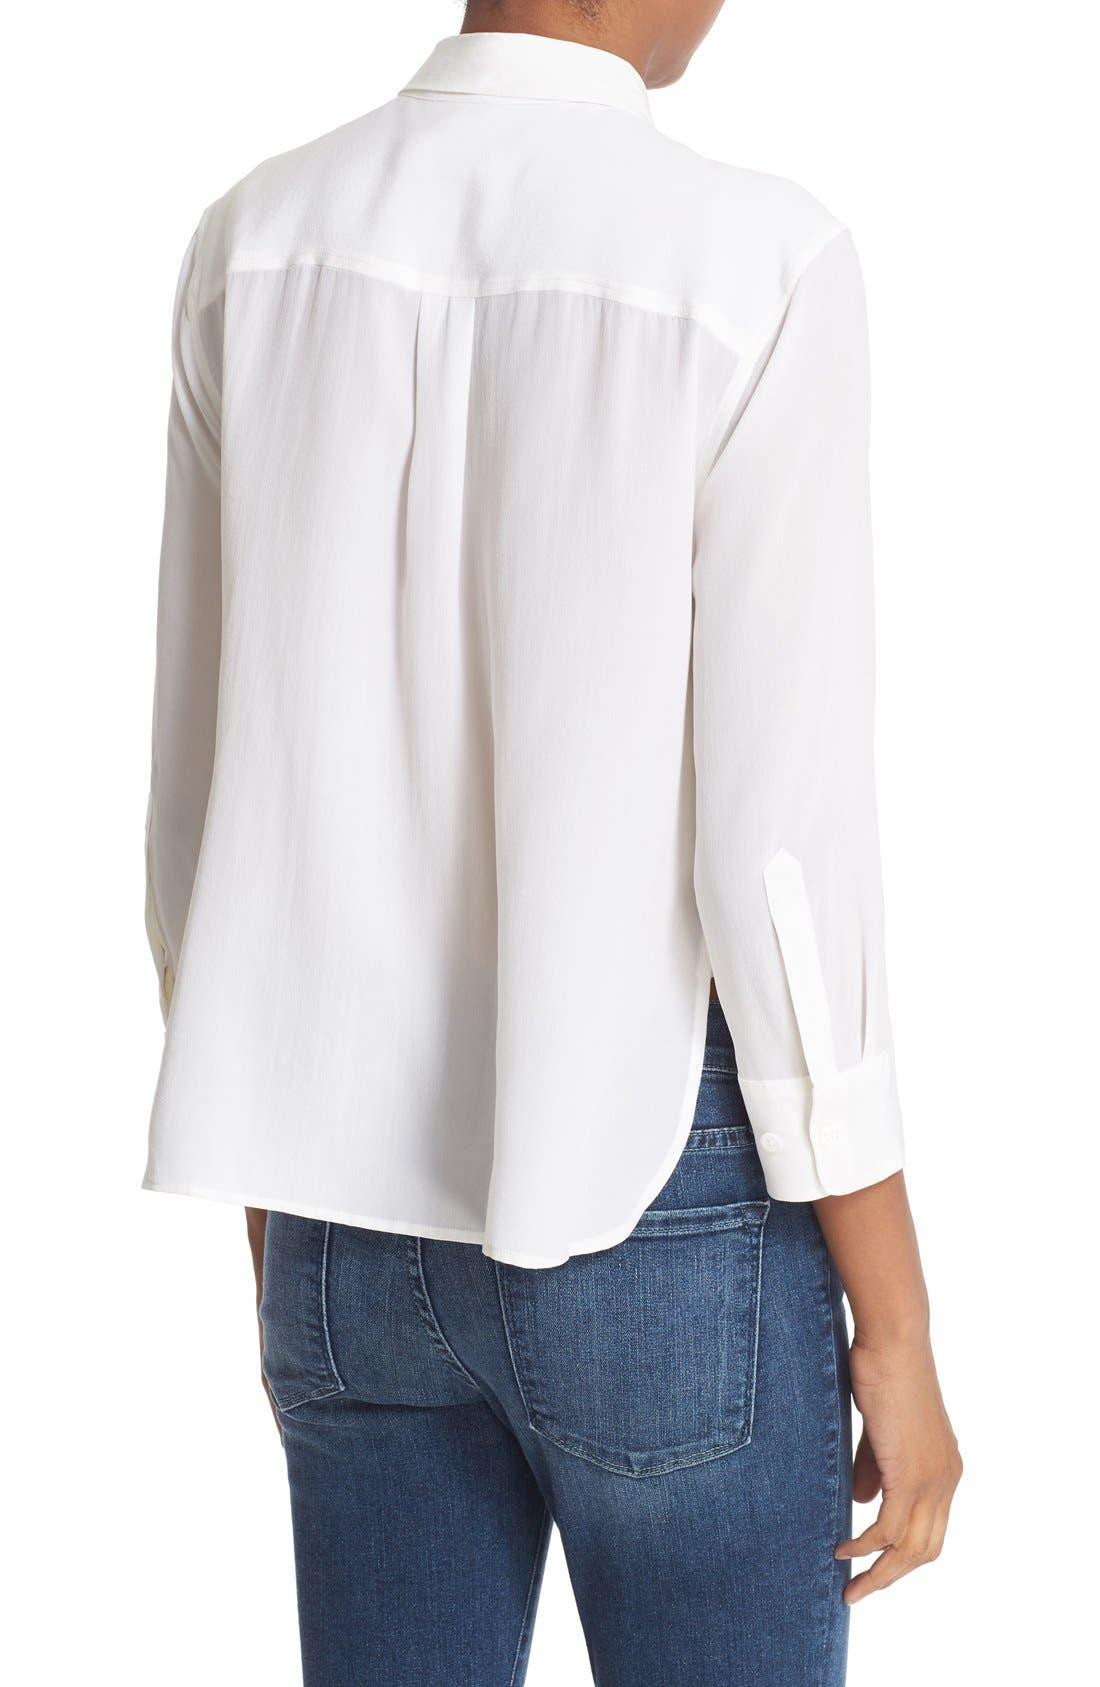 'Signature' Crop Three Quarter Sleeve Shirt,                             Alternate thumbnail 2, color,                             Bright White